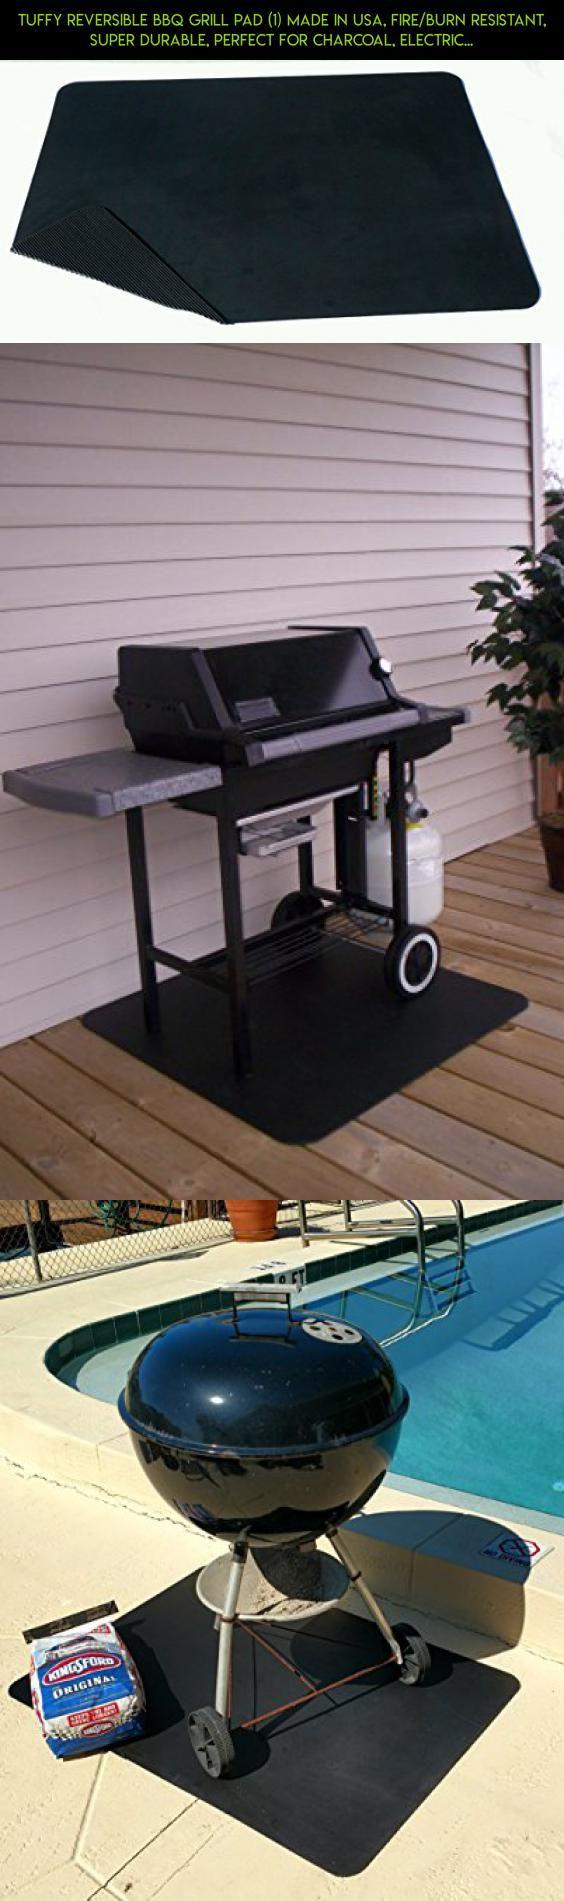 best 25 bbq gas grills ideas on pinterest outdoor gas grills